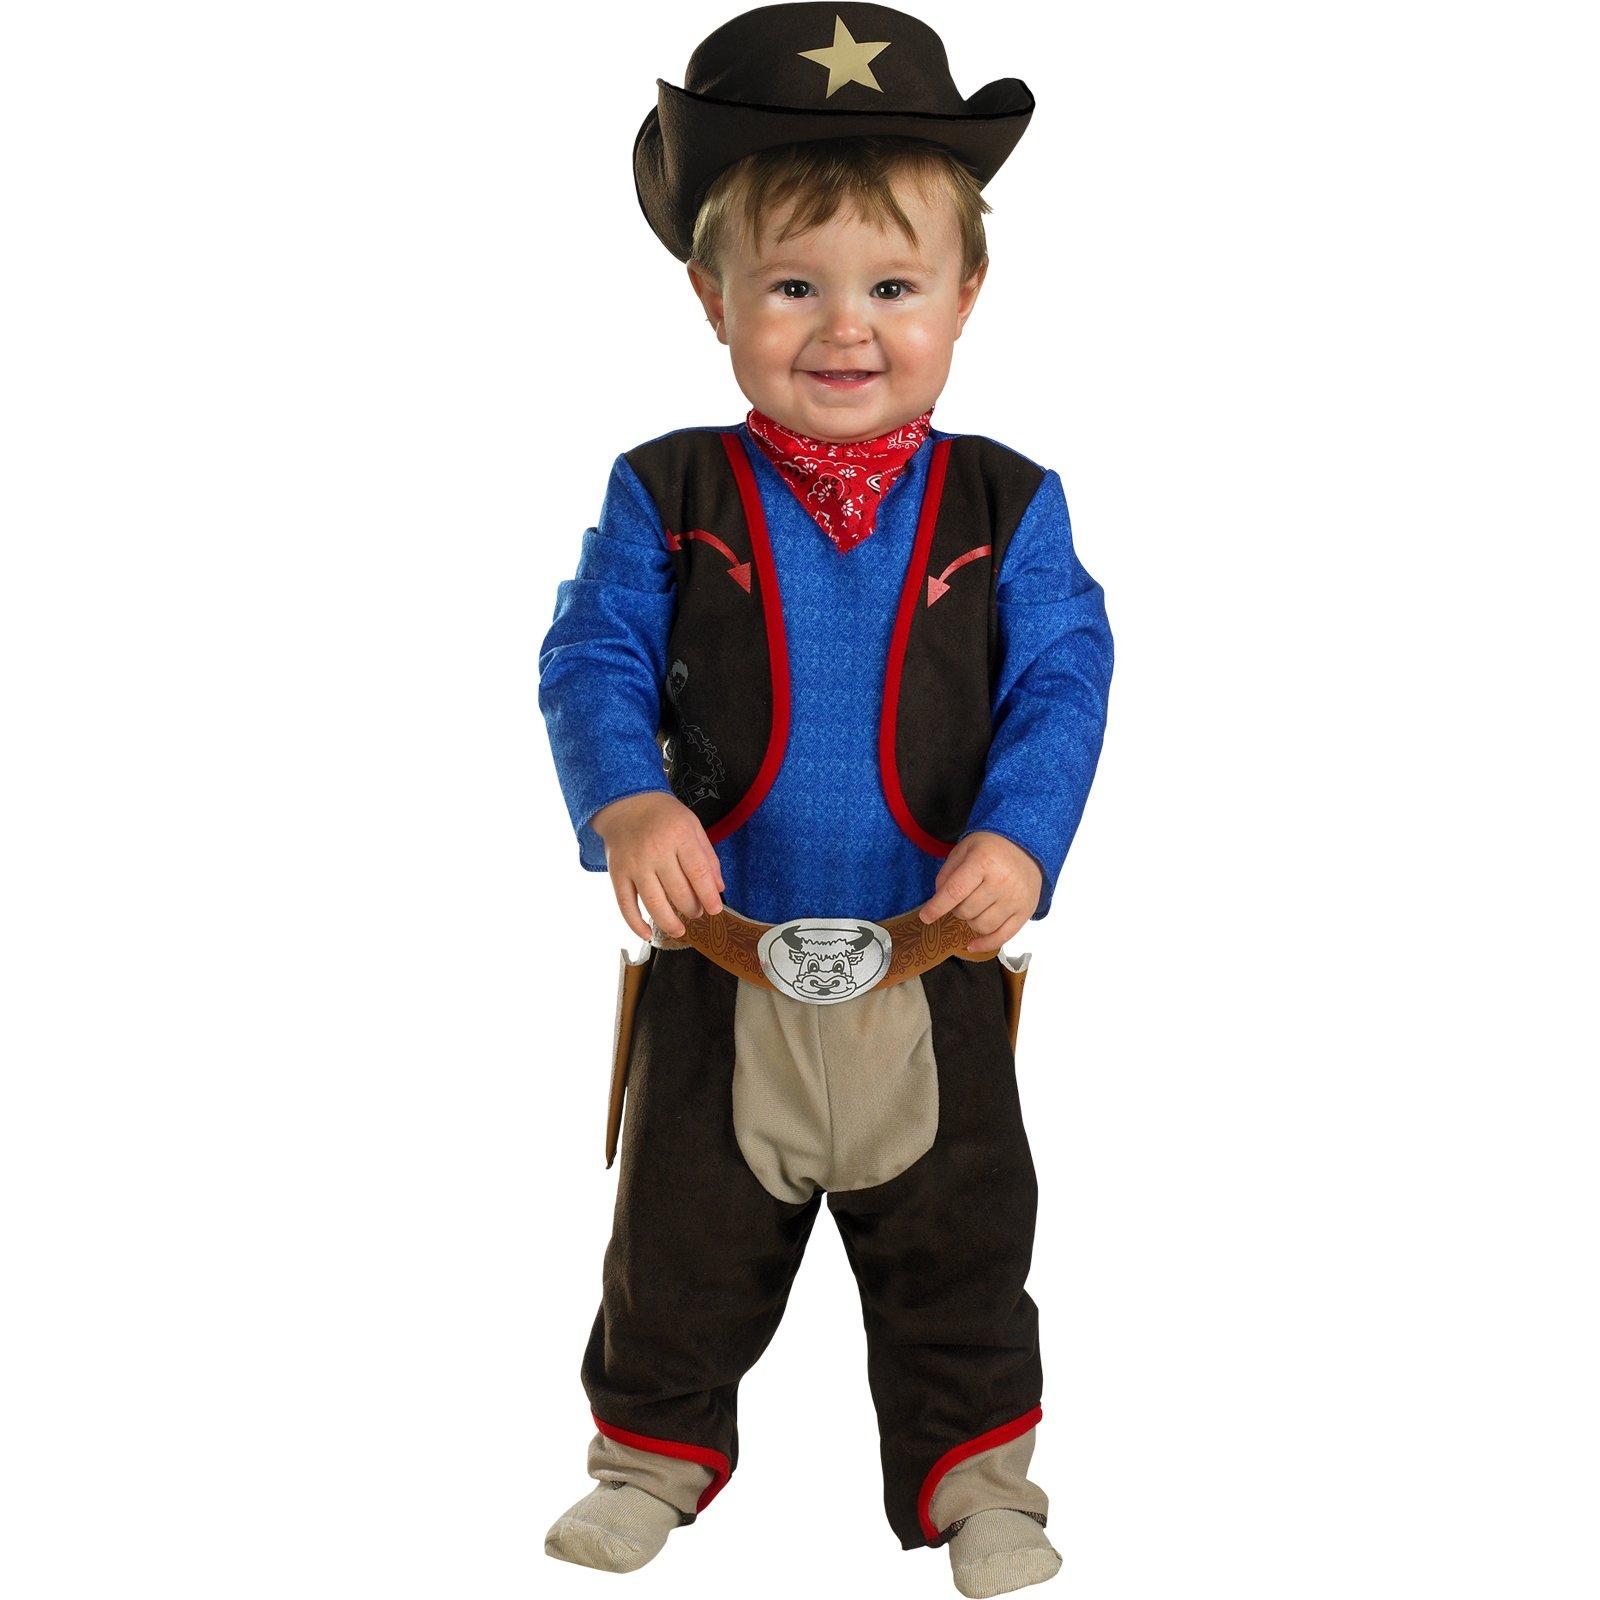 Новогодний костюм для мальчика своими руками с фото